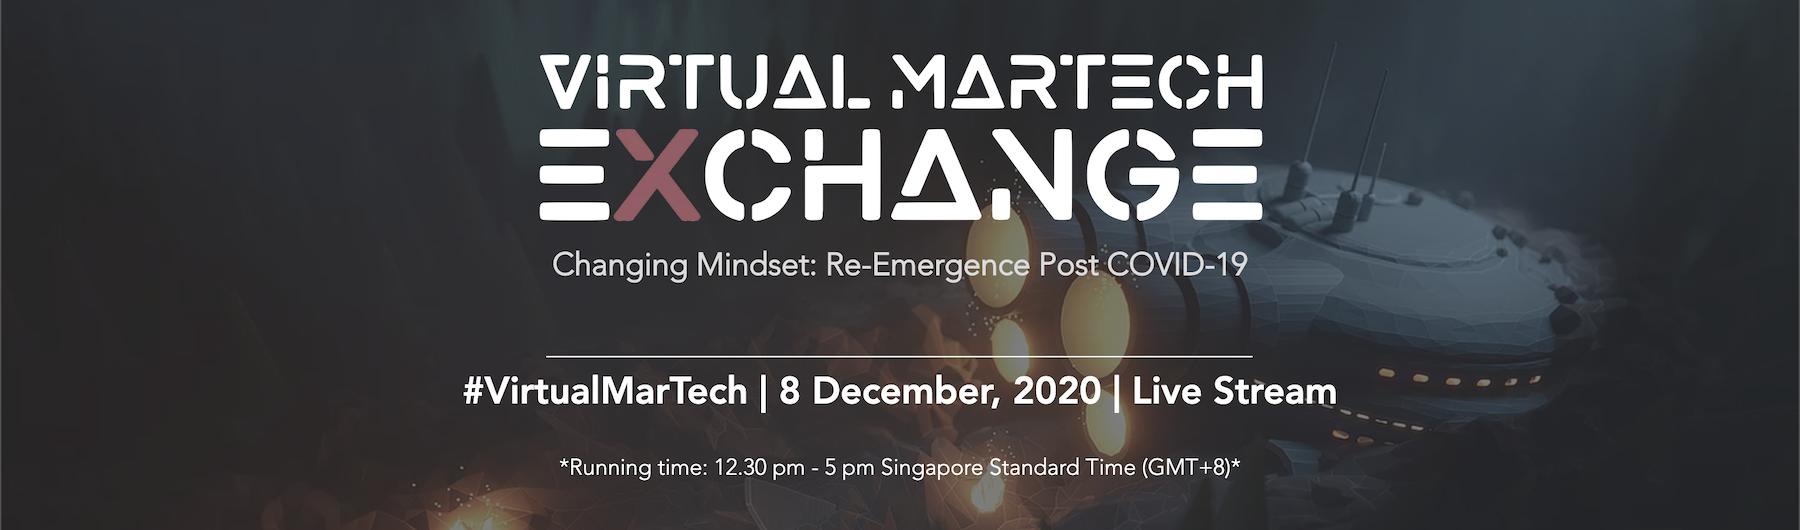 The Virtual MarTech Exchange Summit